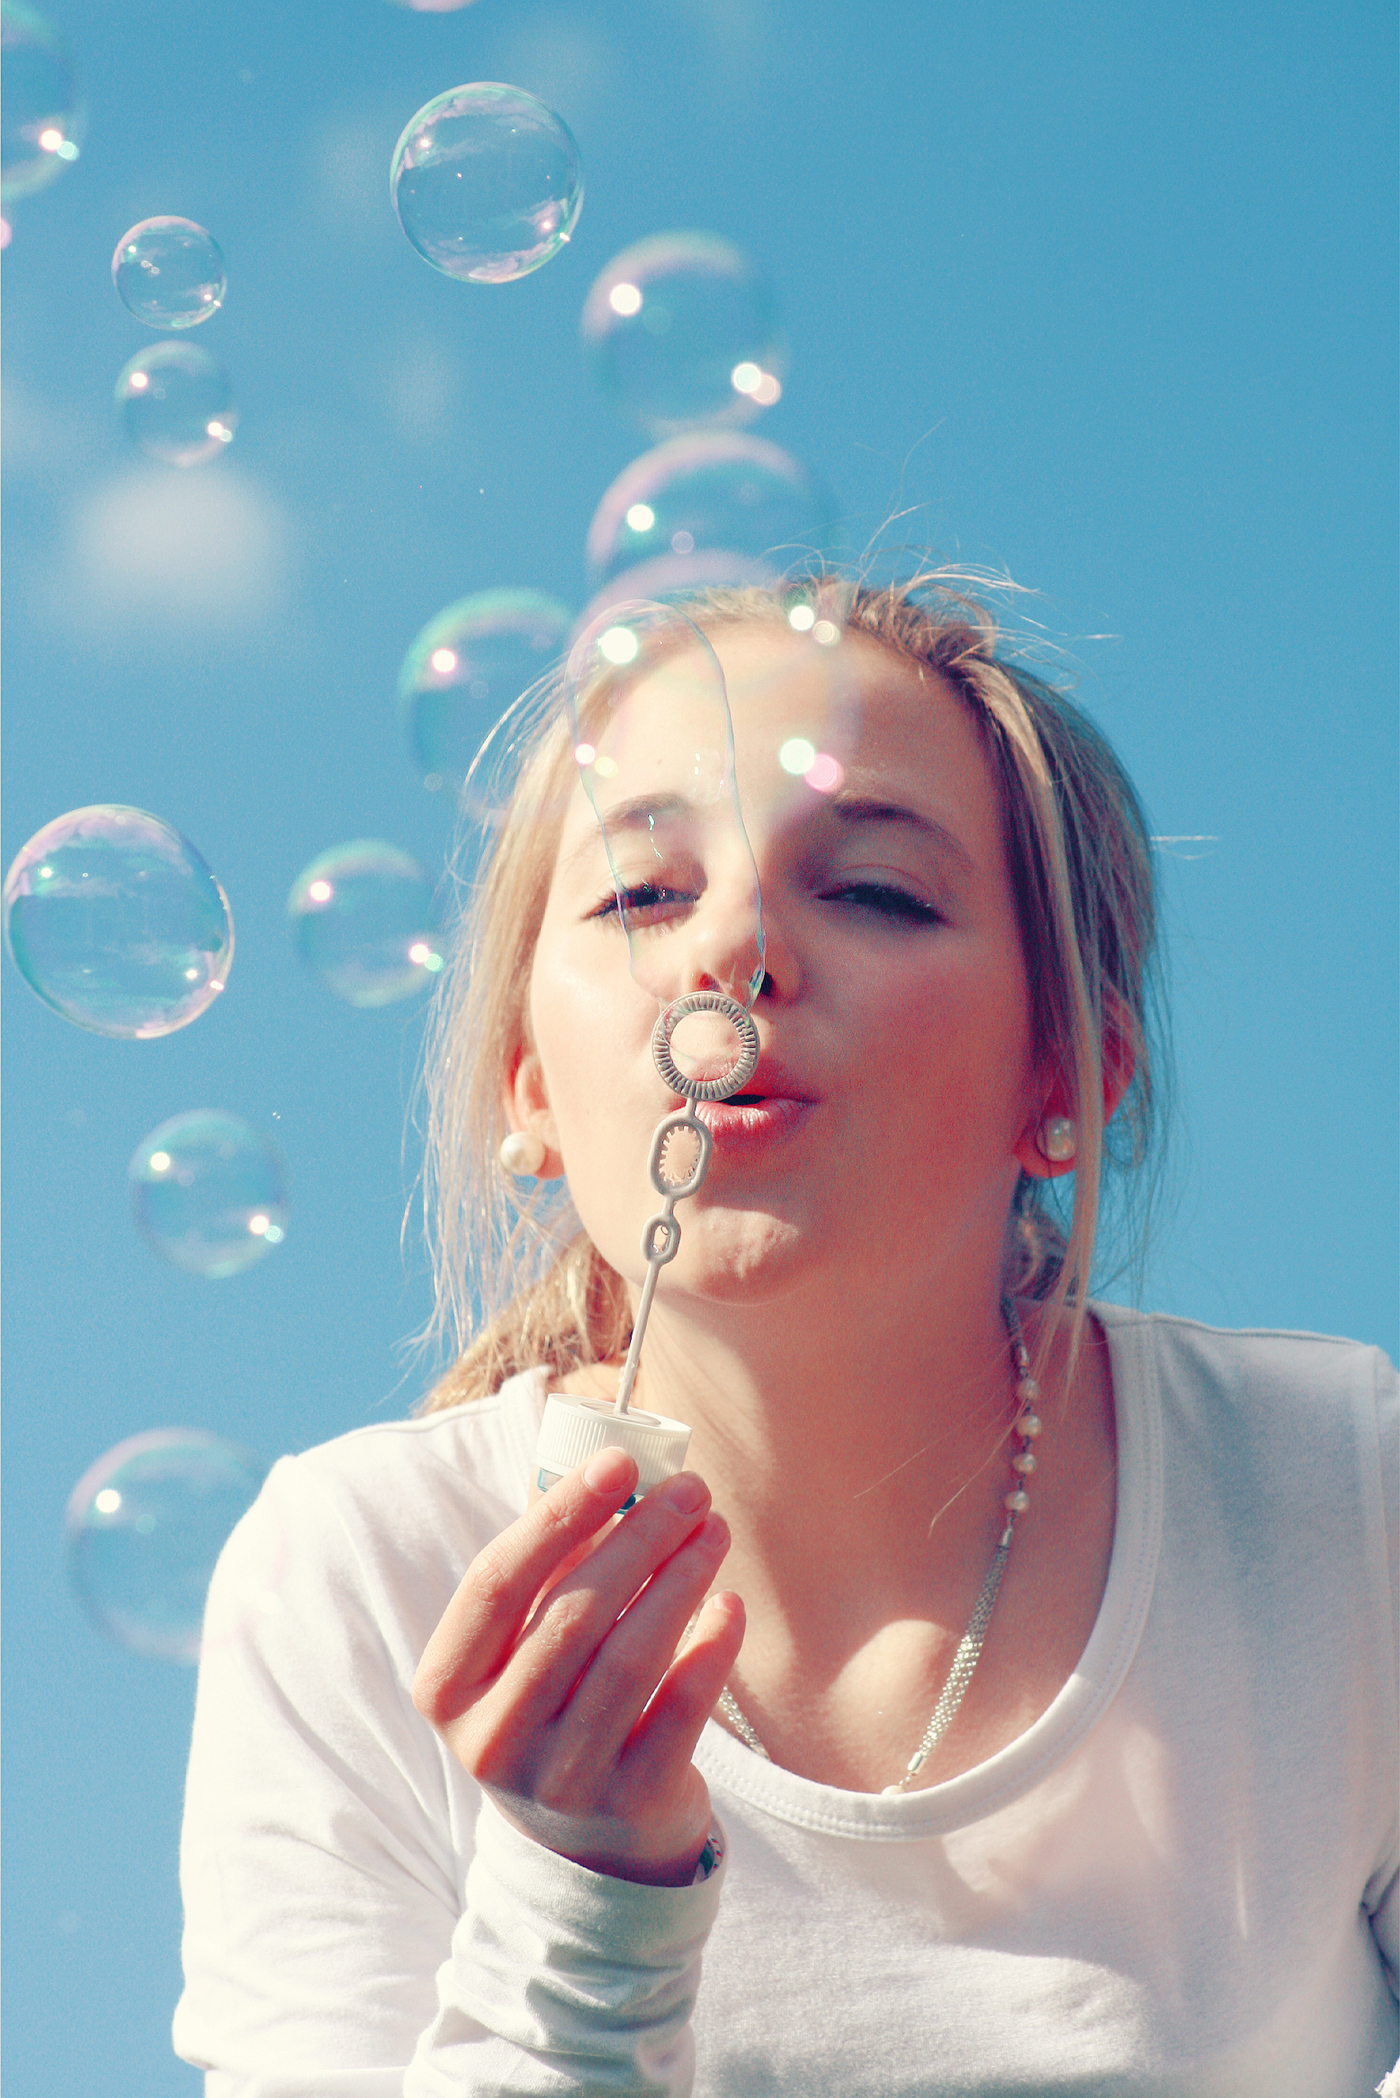 Bubbles III by Claerii